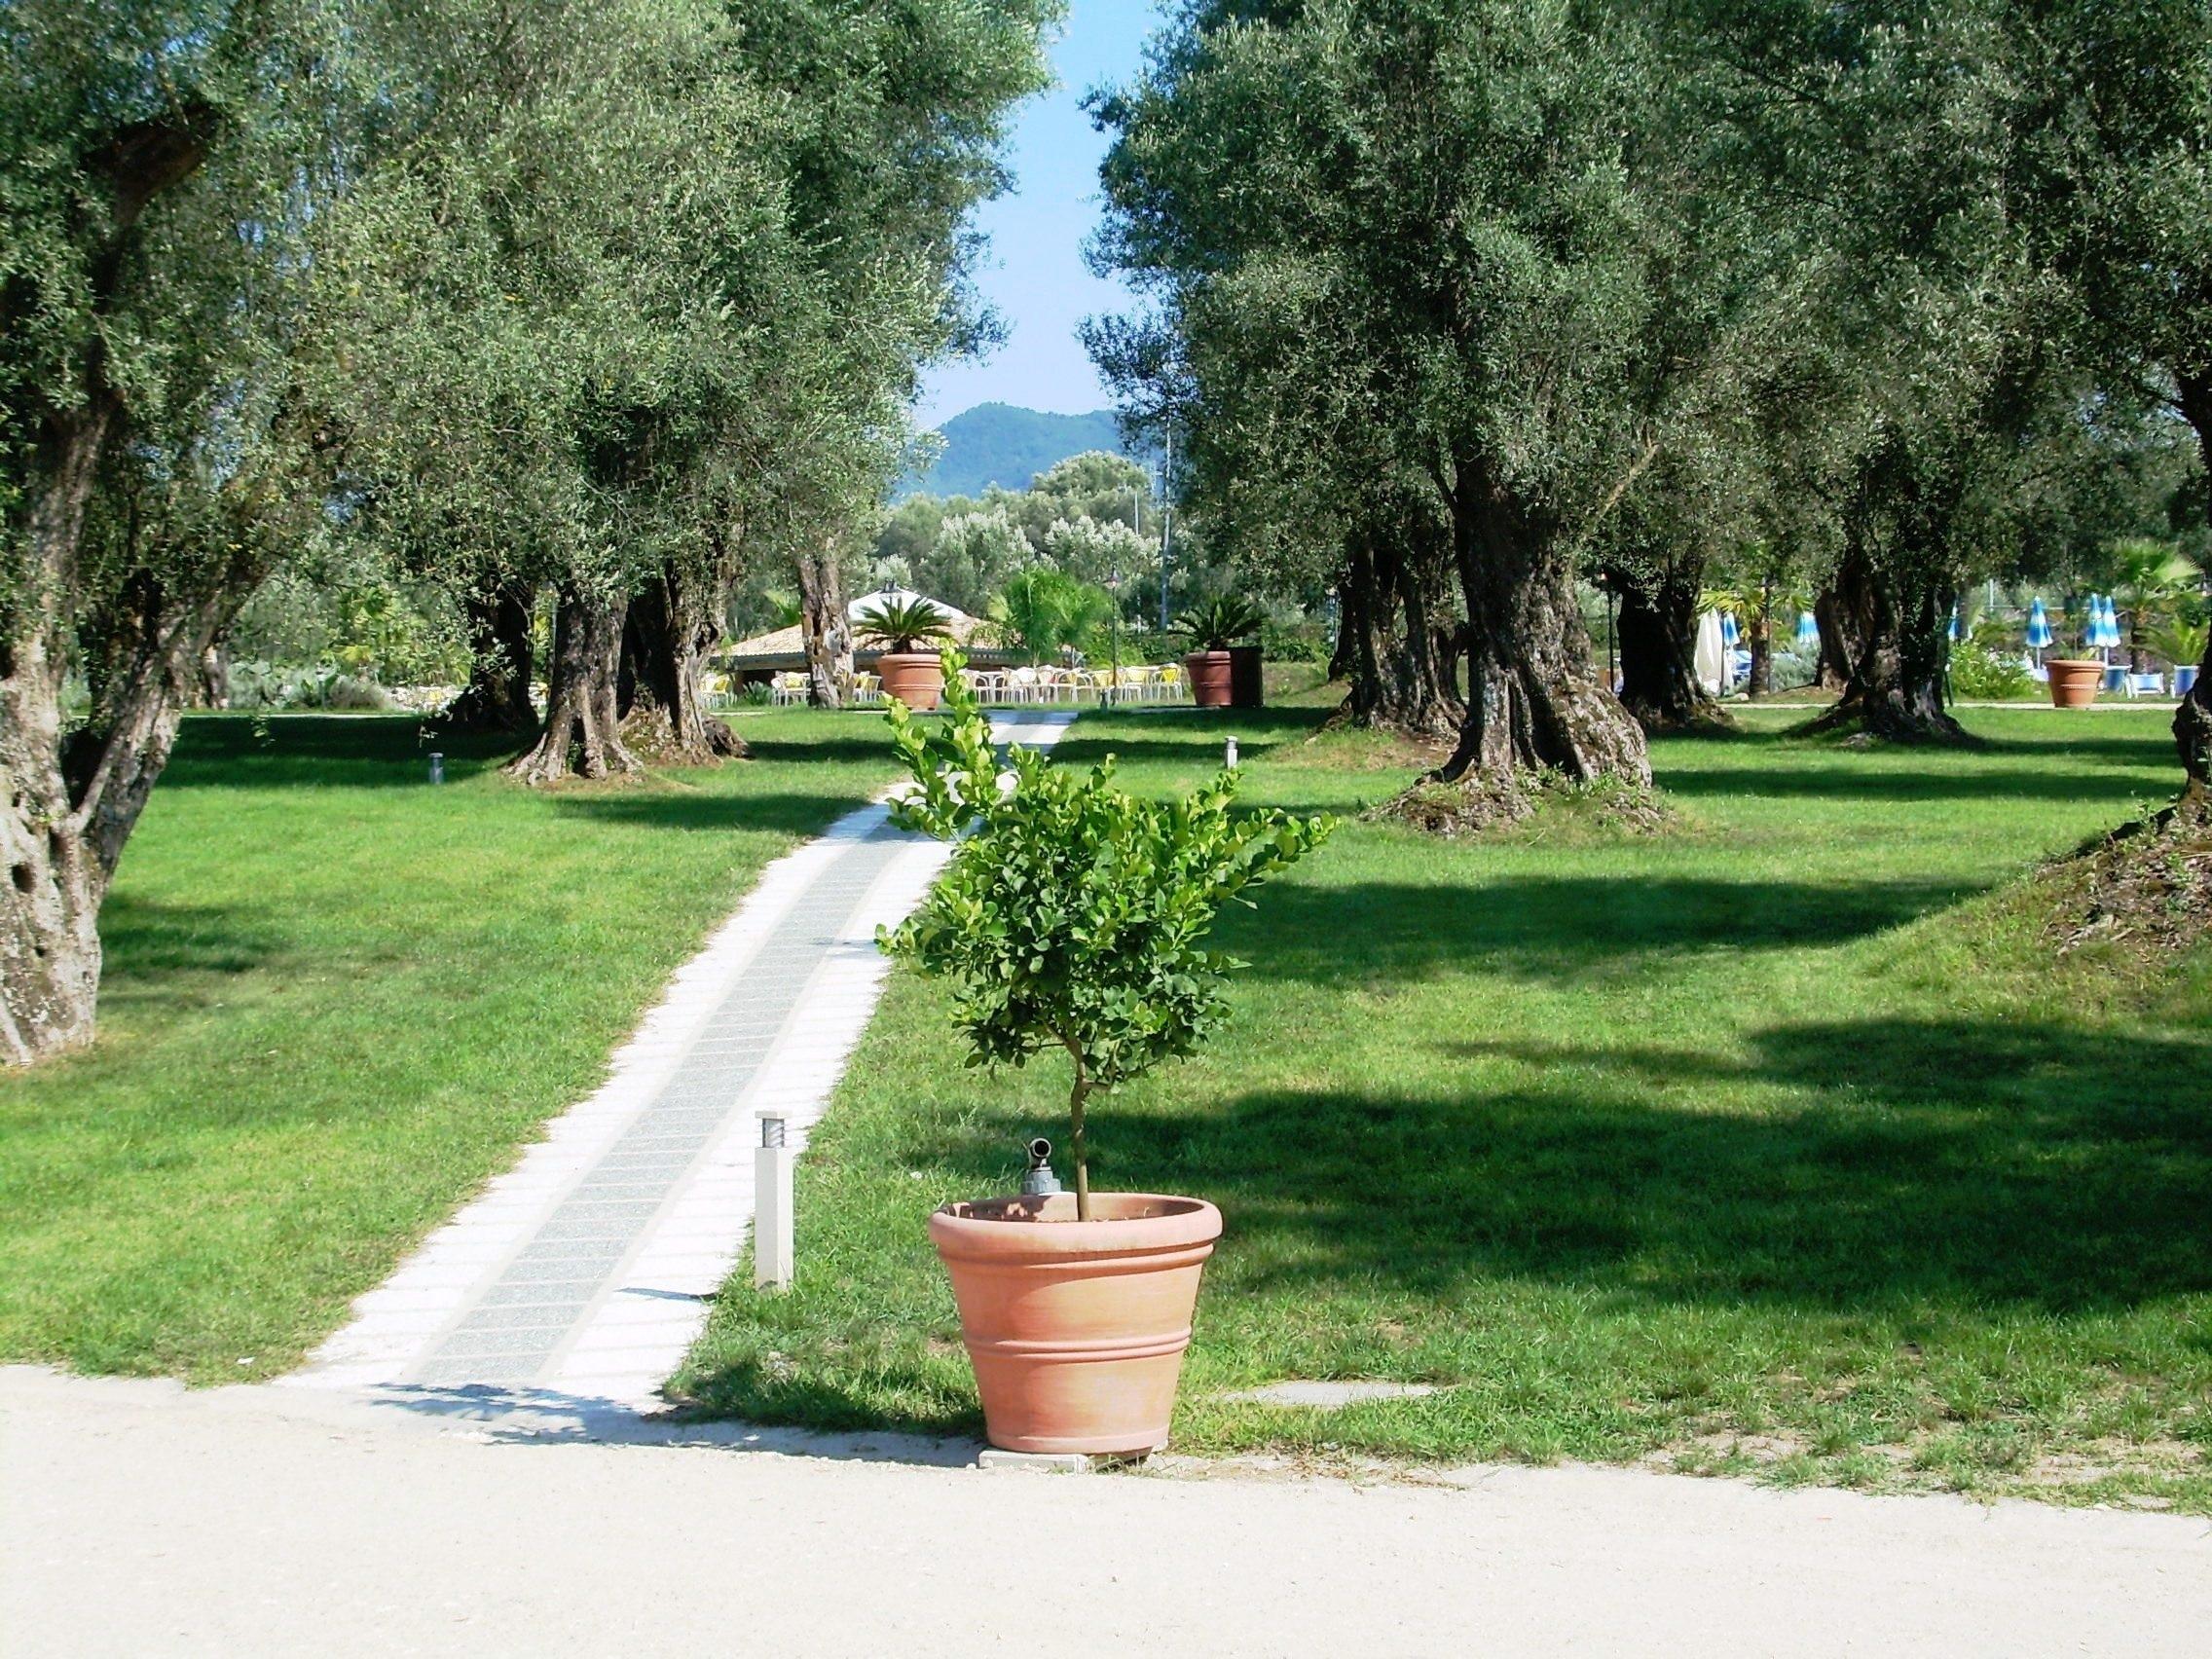 Cittanova, Calabrië, Italië